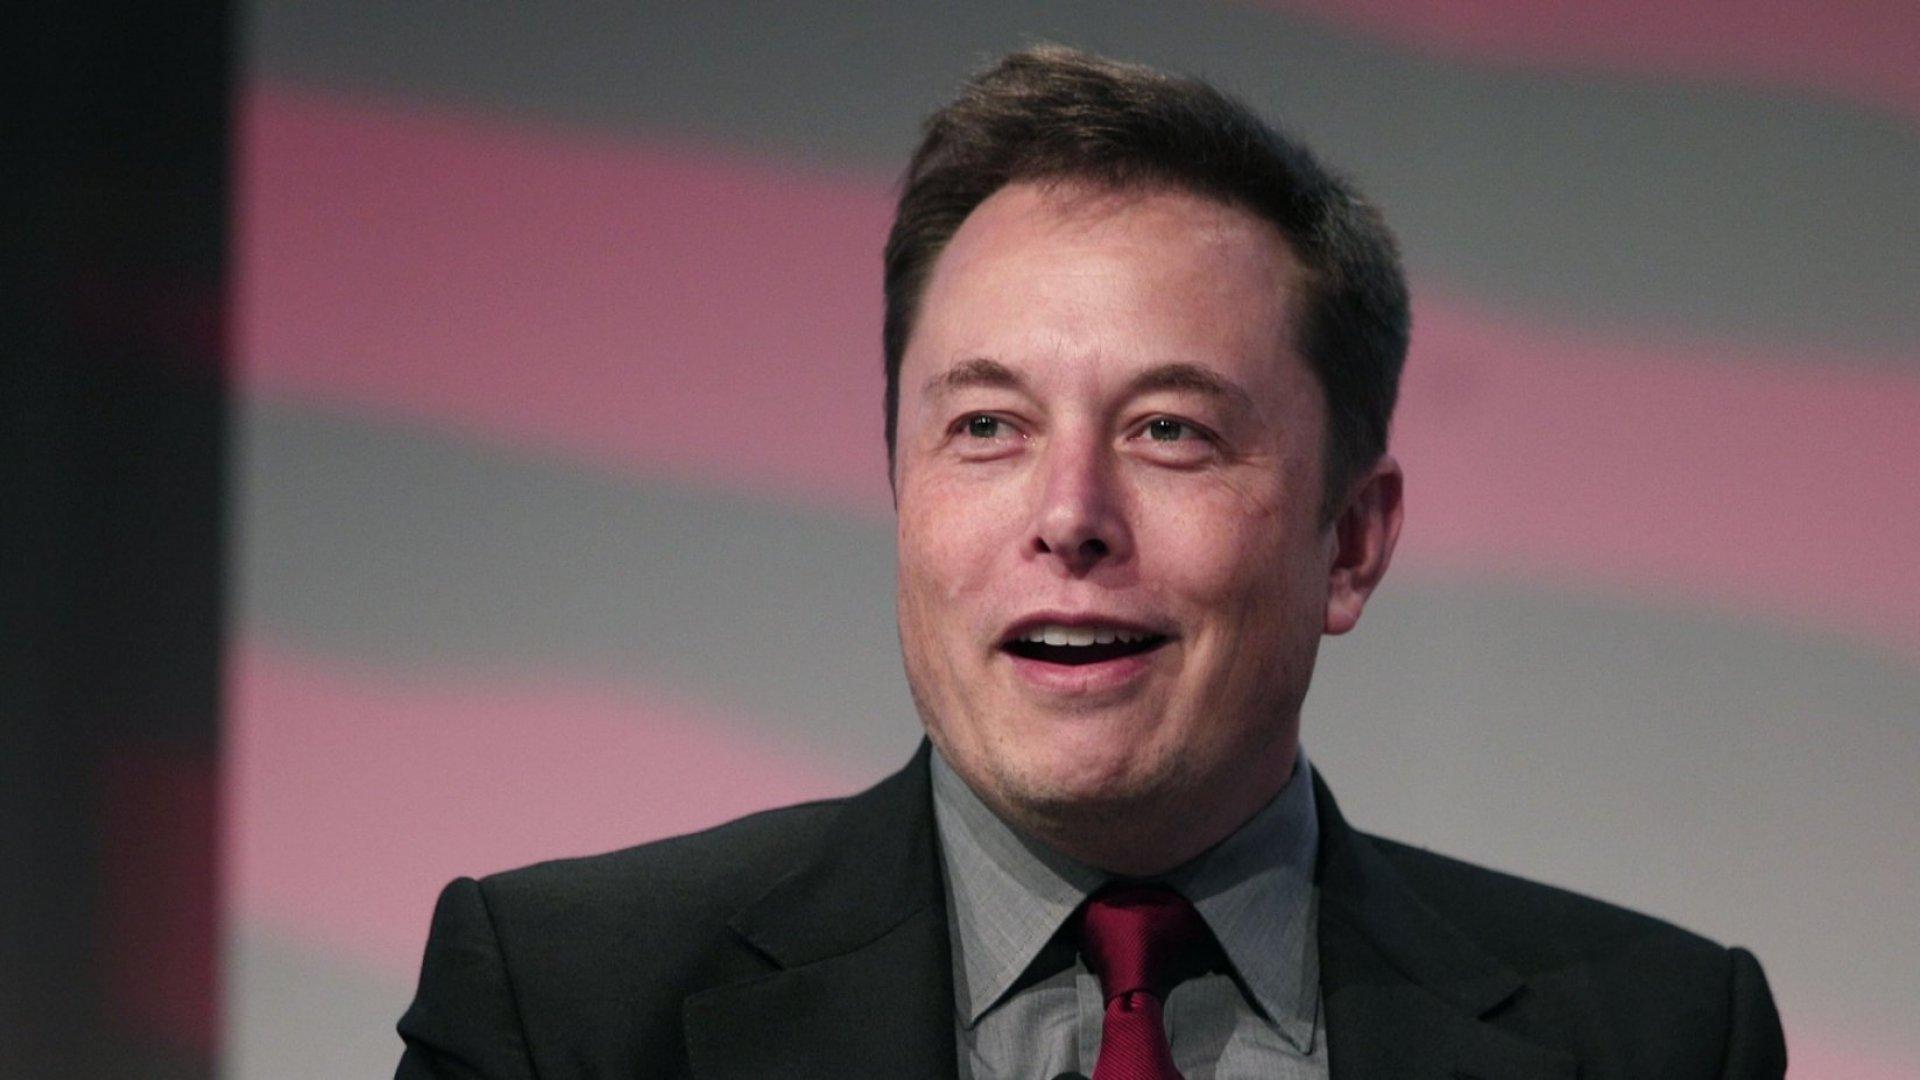 Elon Musk's Tesla Bankruptcy Joke Shows 1 Way to Overcome Fear